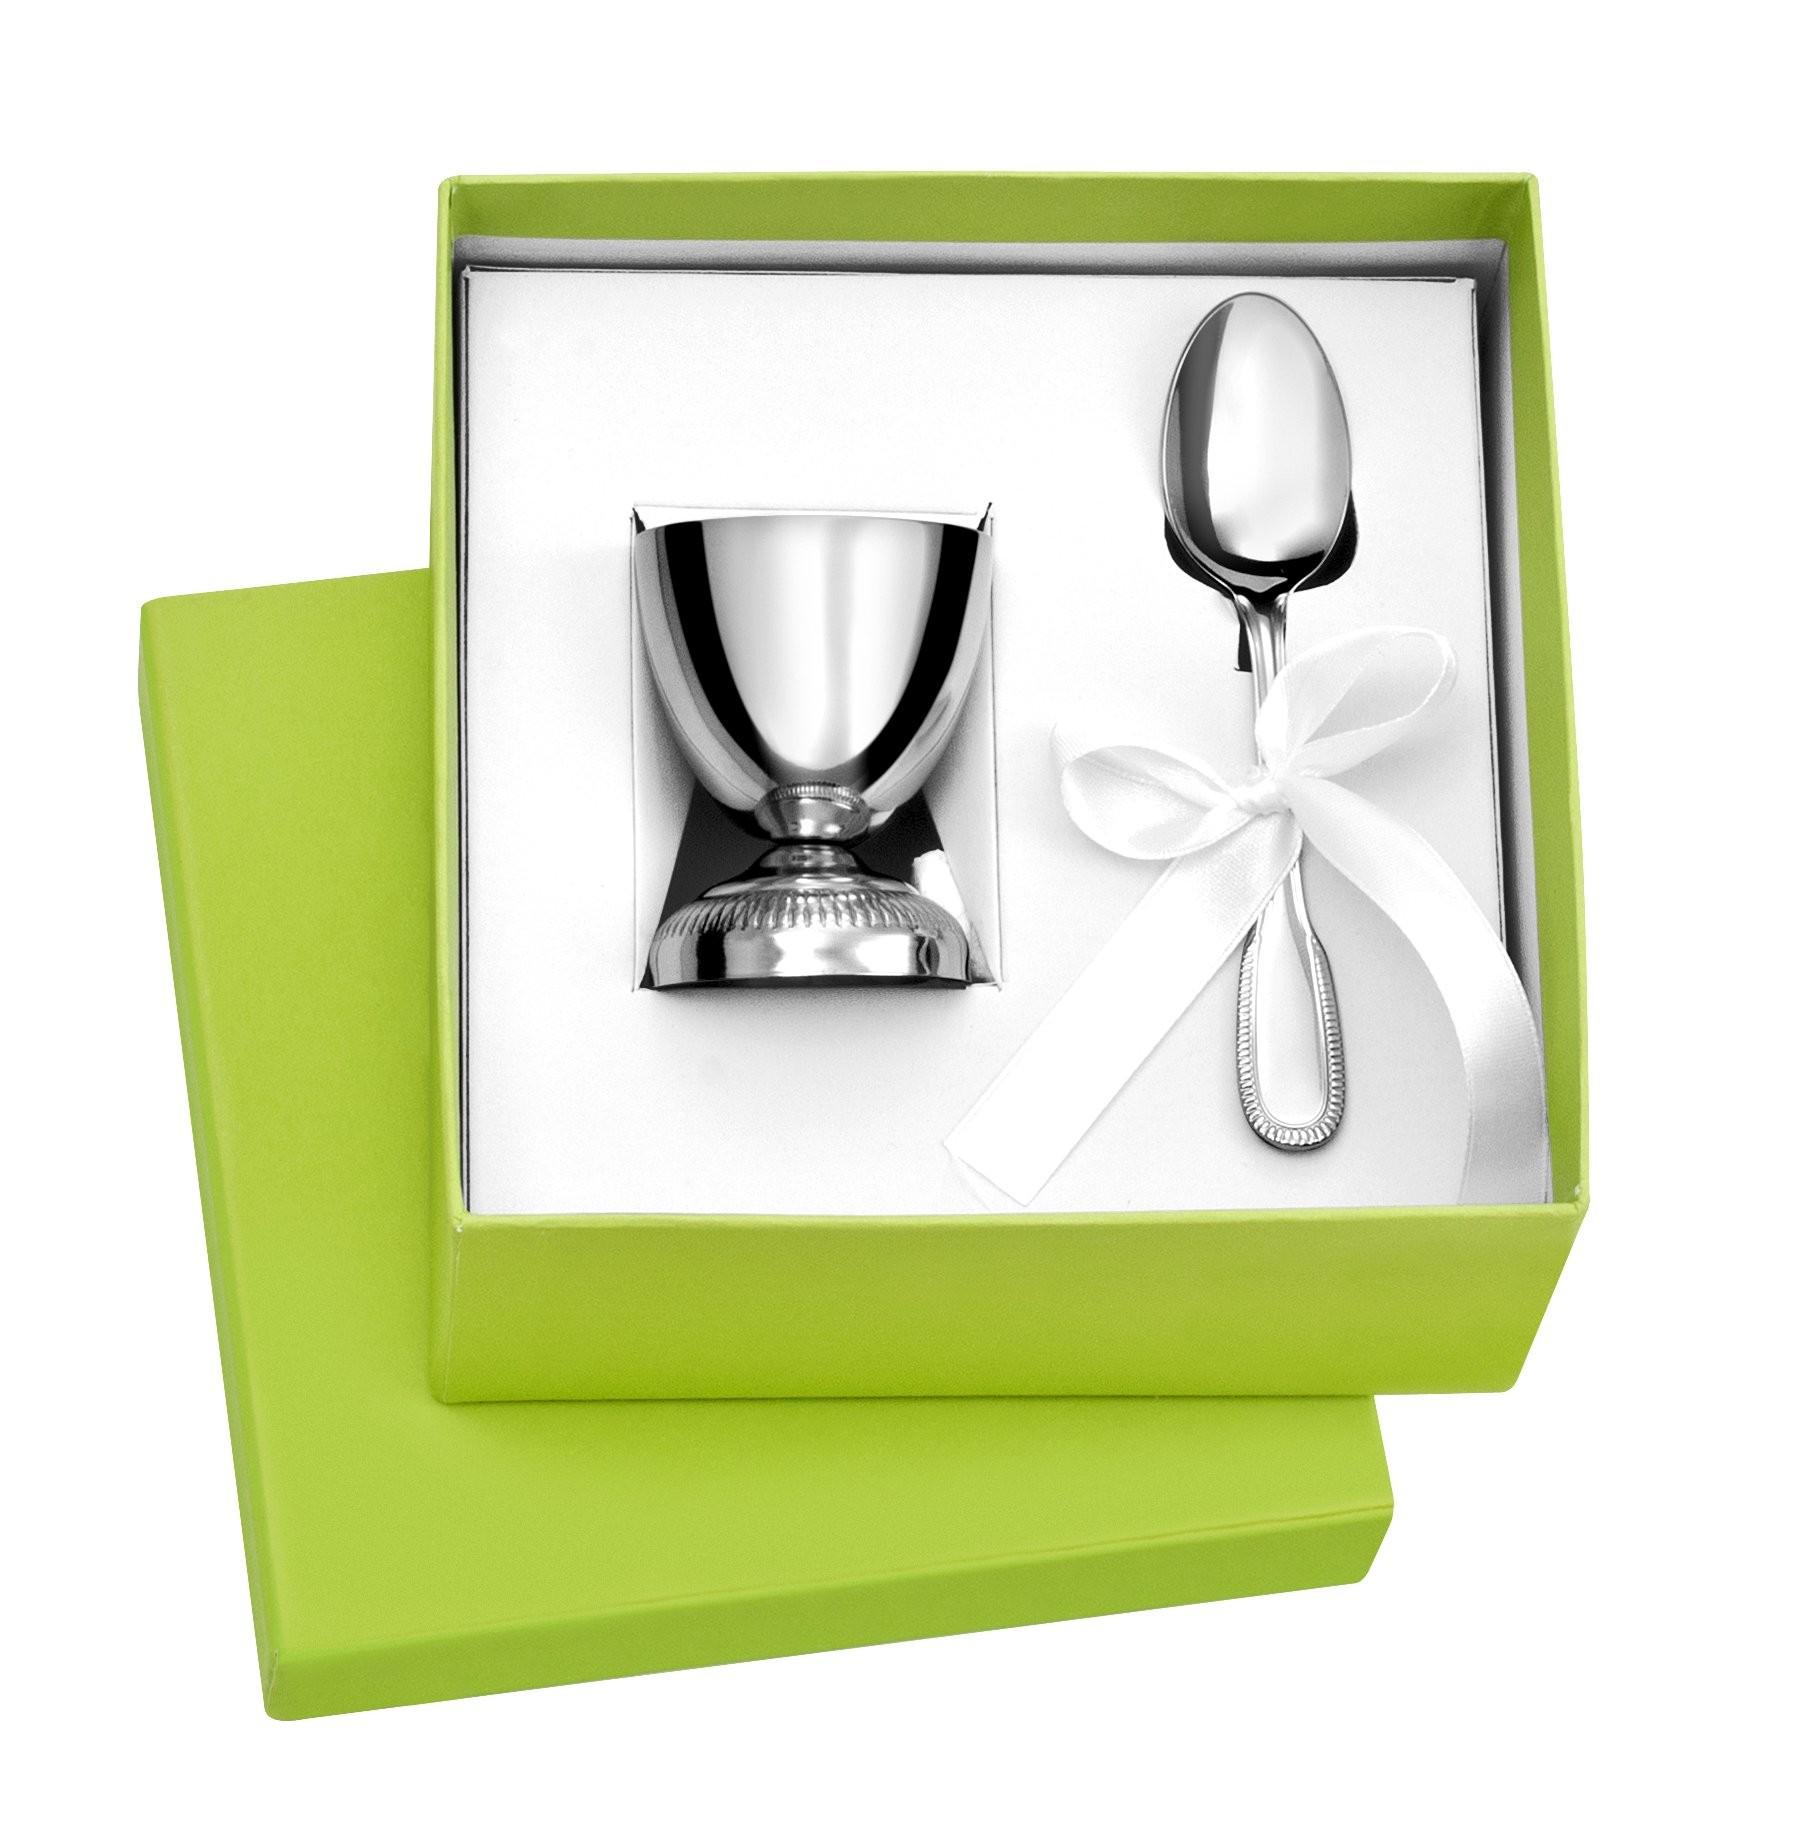 coquetier et cuill re en inox cadeaux de baptemes prix. Black Bedroom Furniture Sets. Home Design Ideas